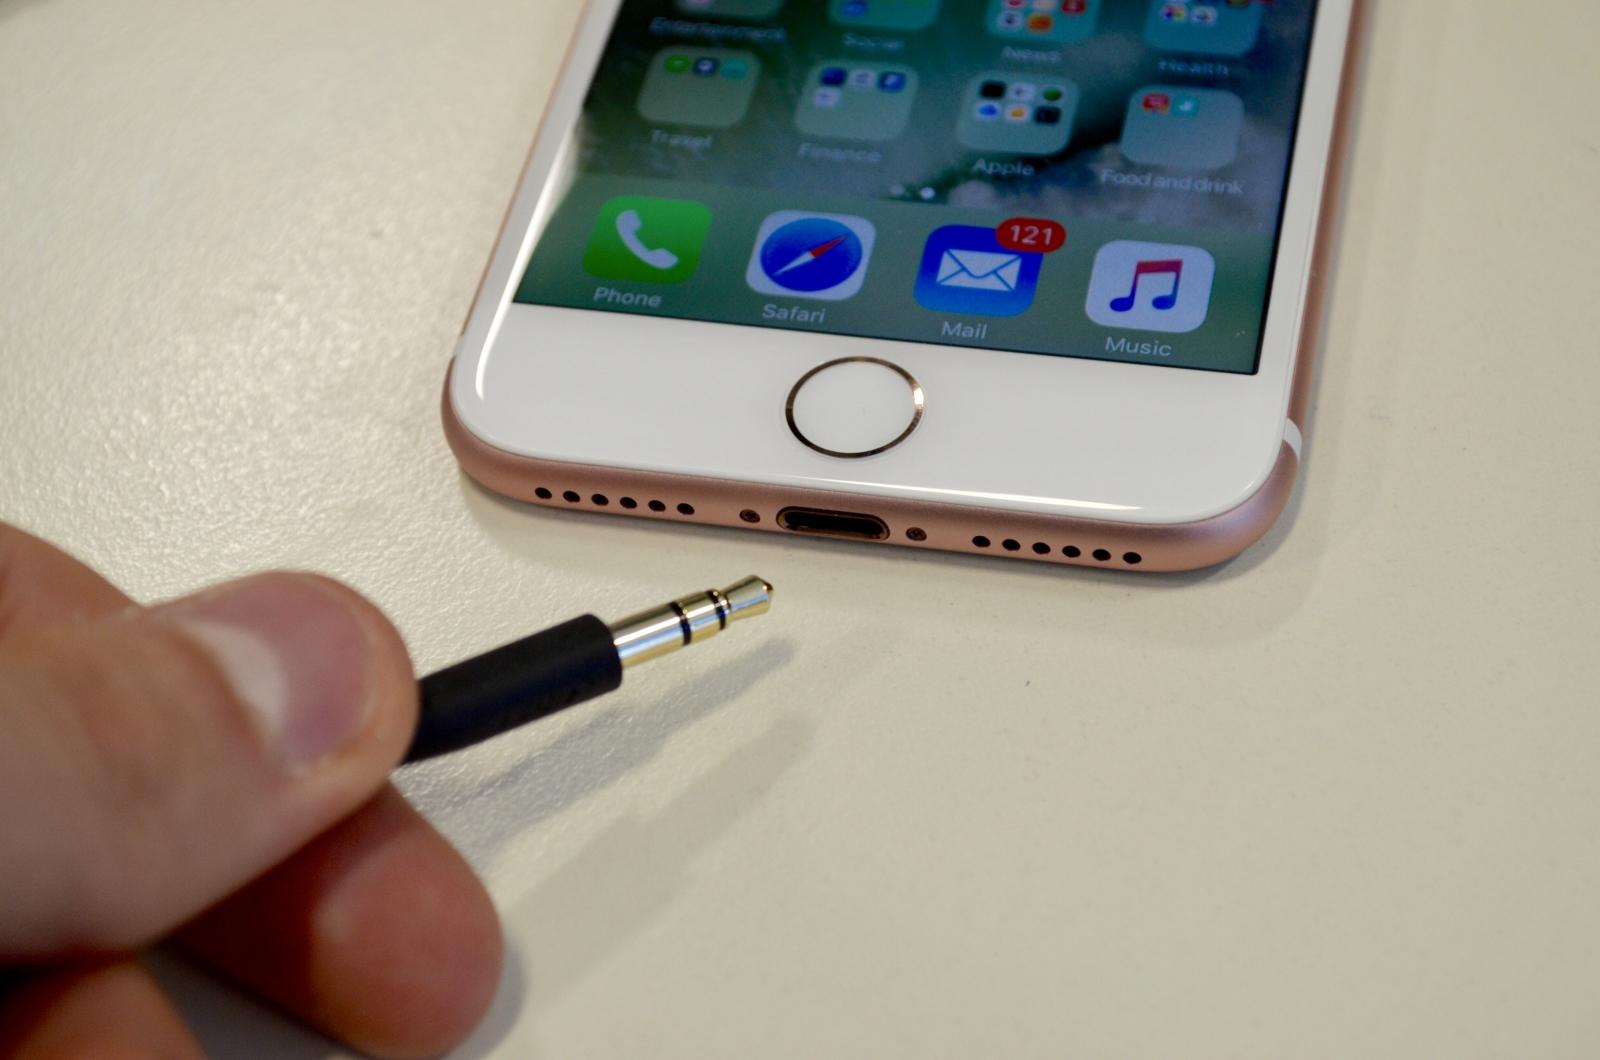 Apple iPhone 7 headphones